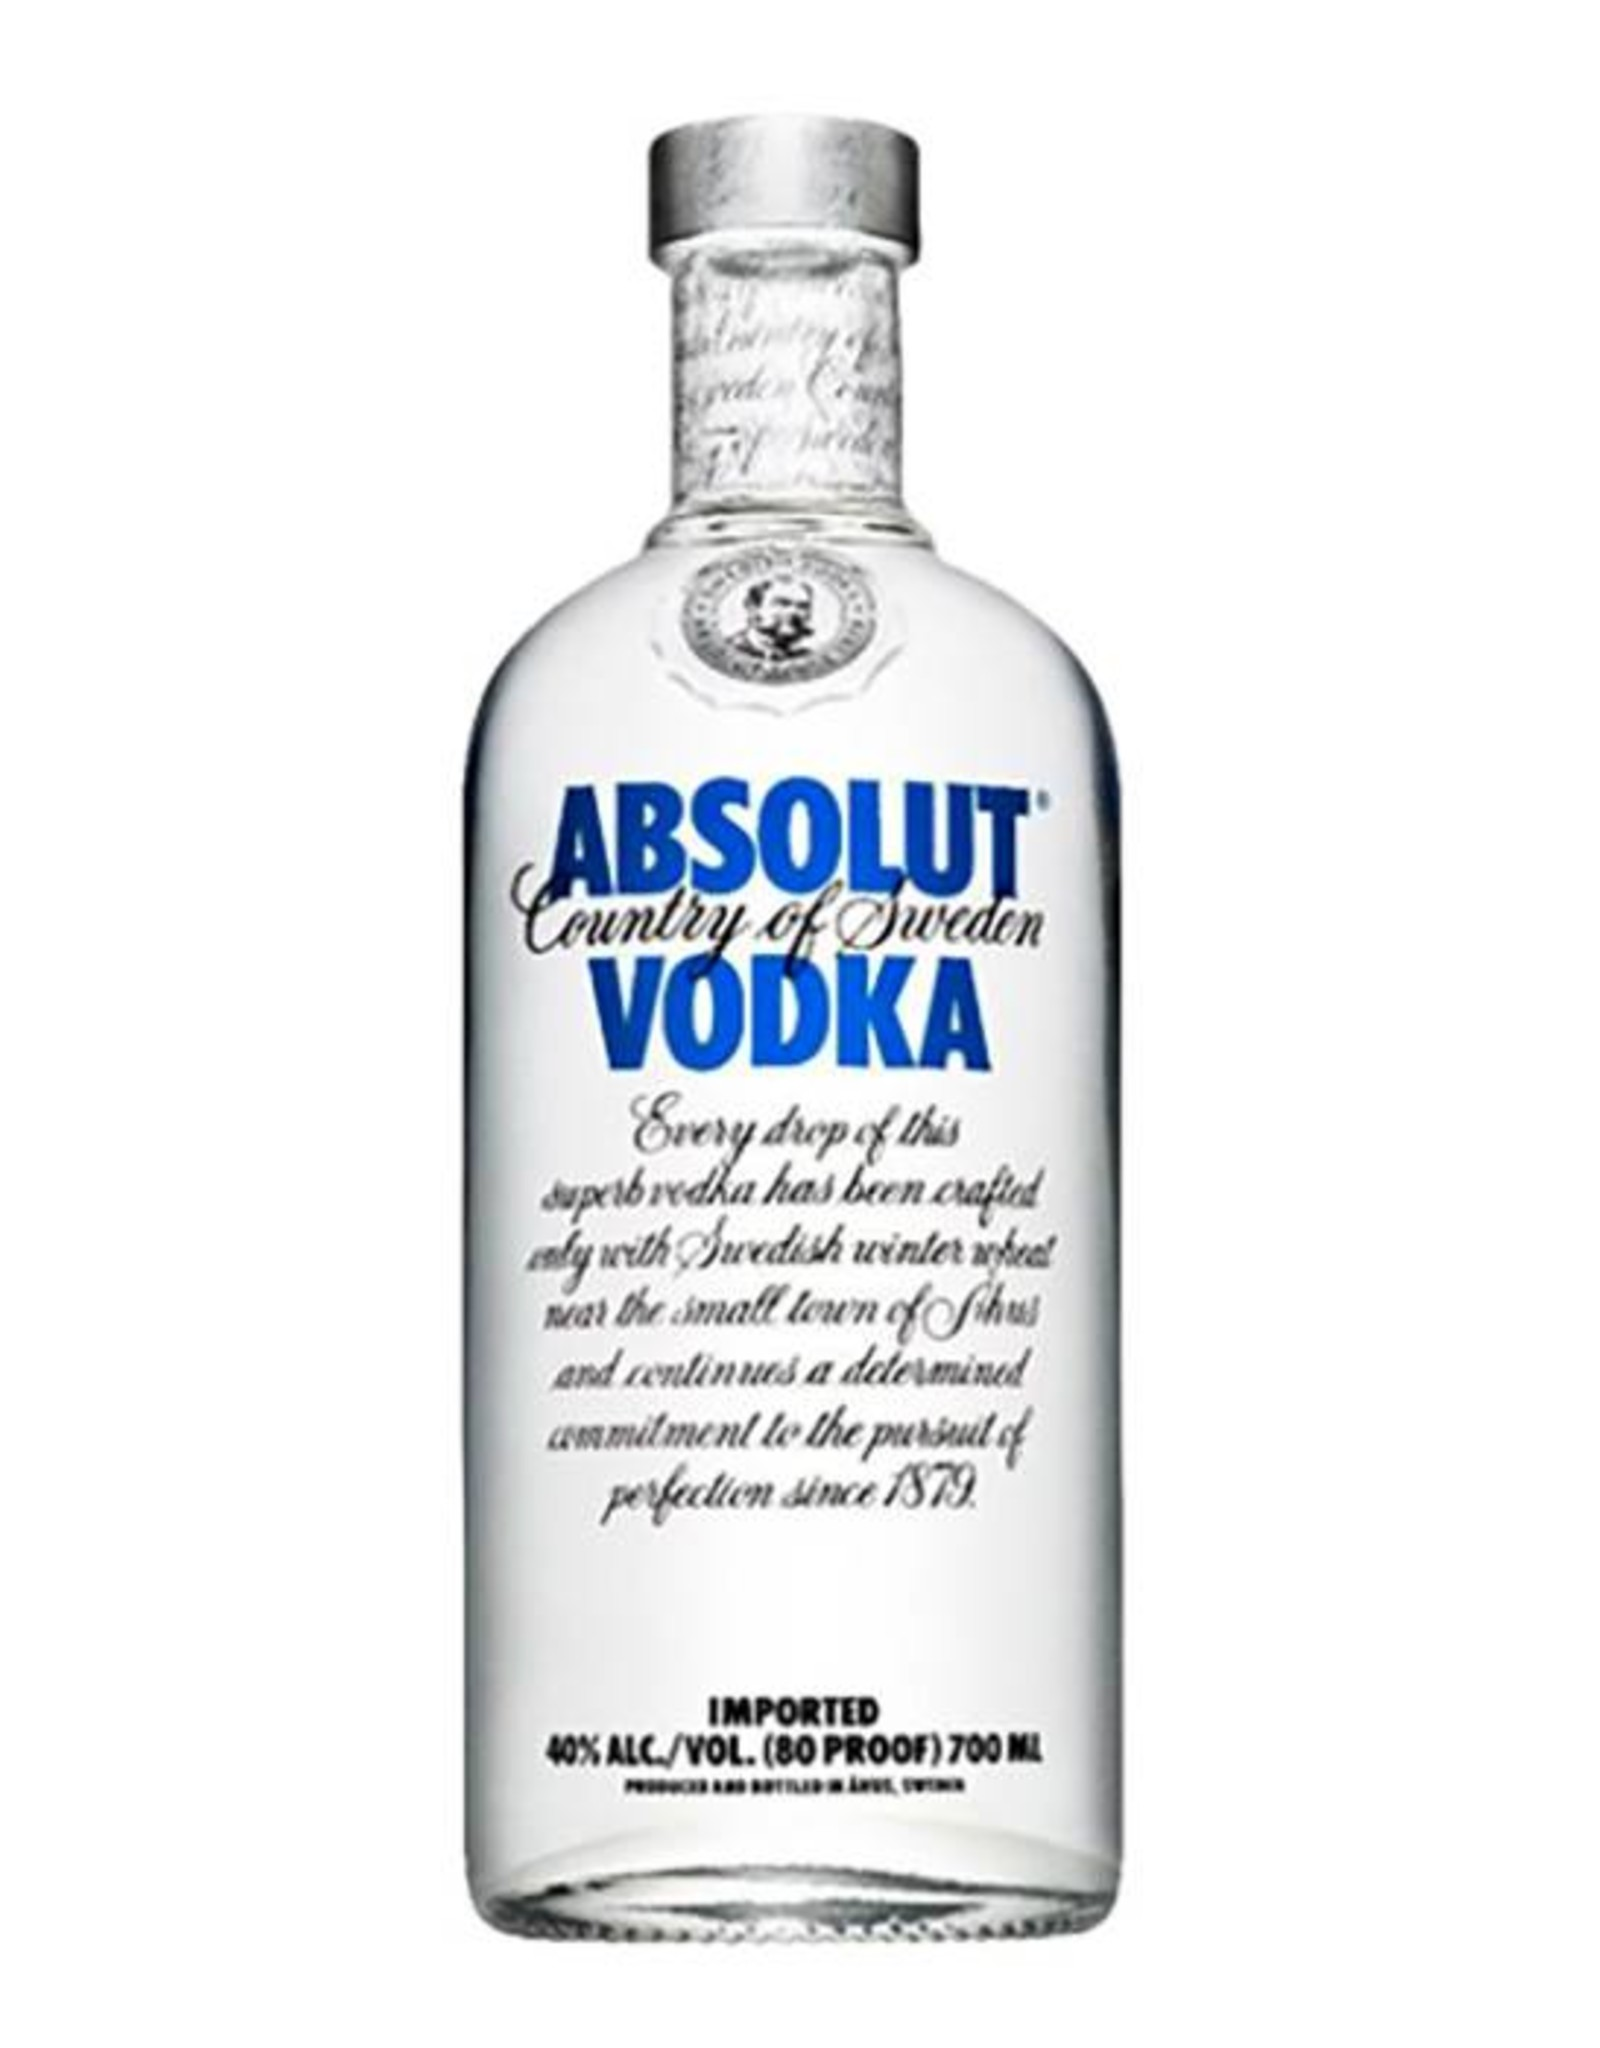 Absolut Blue, Vodka, 40%, 700ml